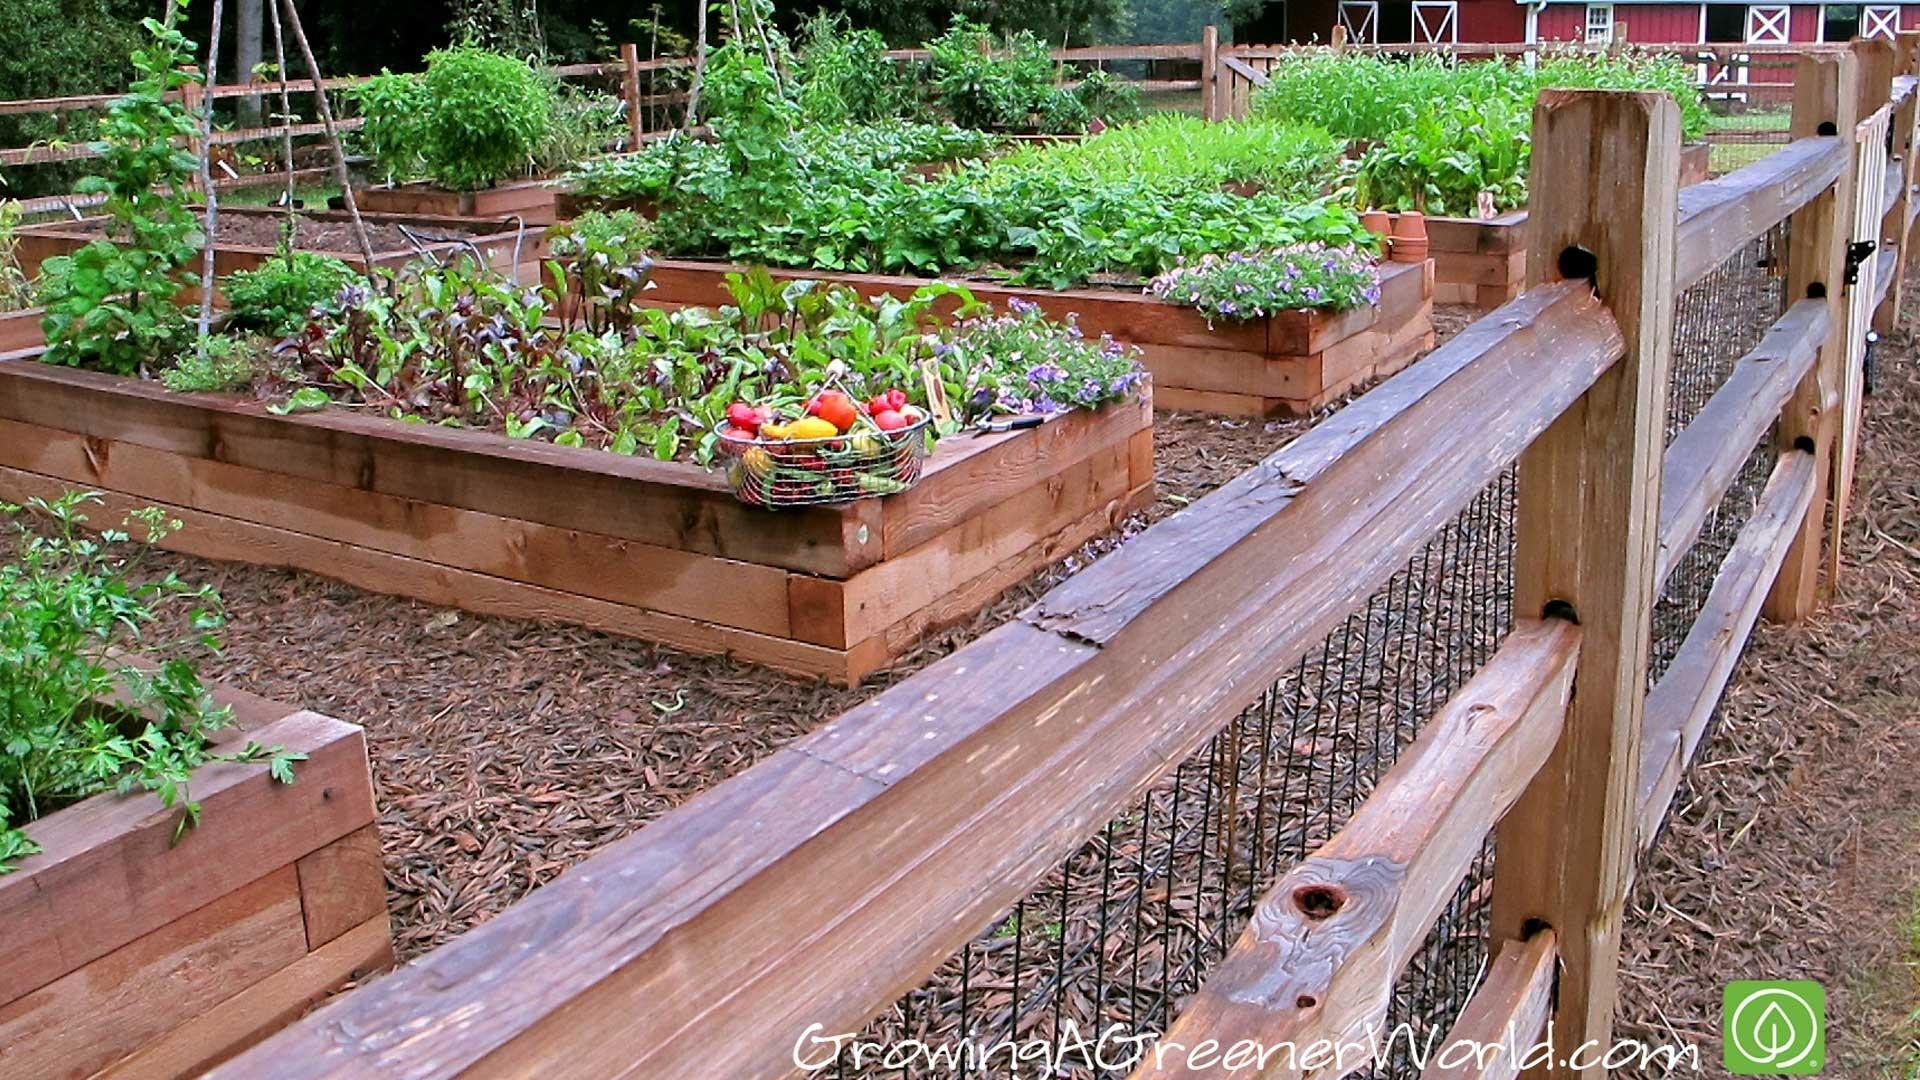 Vegetable & Fruit Gardening Articles